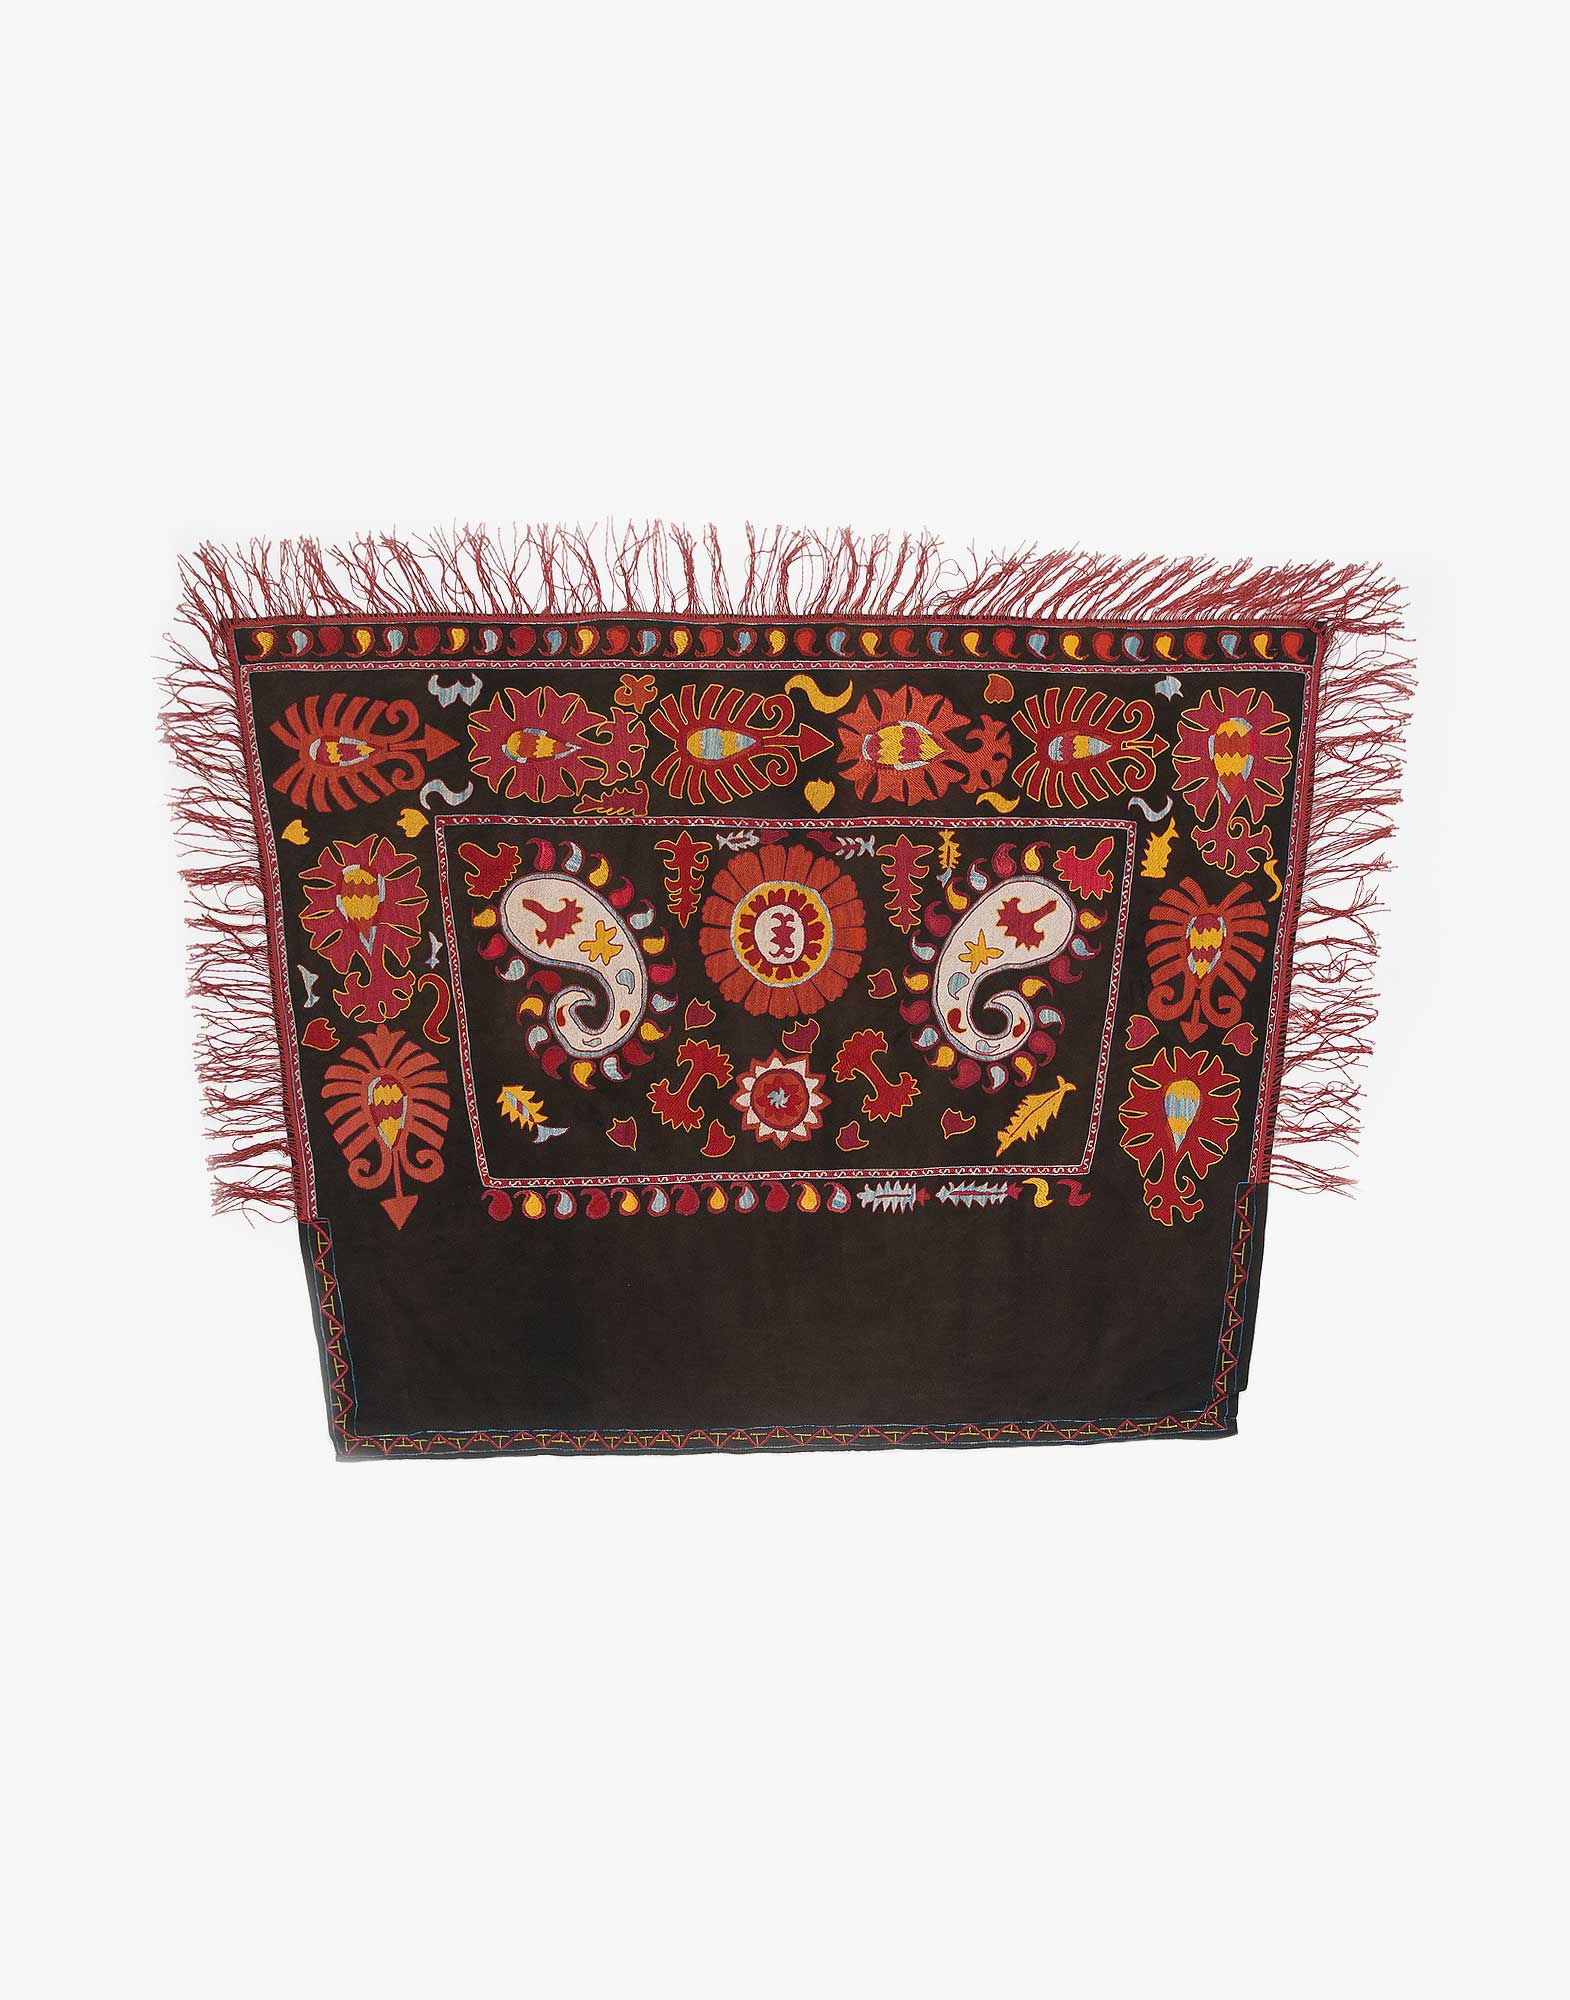 Uzbek Suzani Embroidered Silk Horse Cover